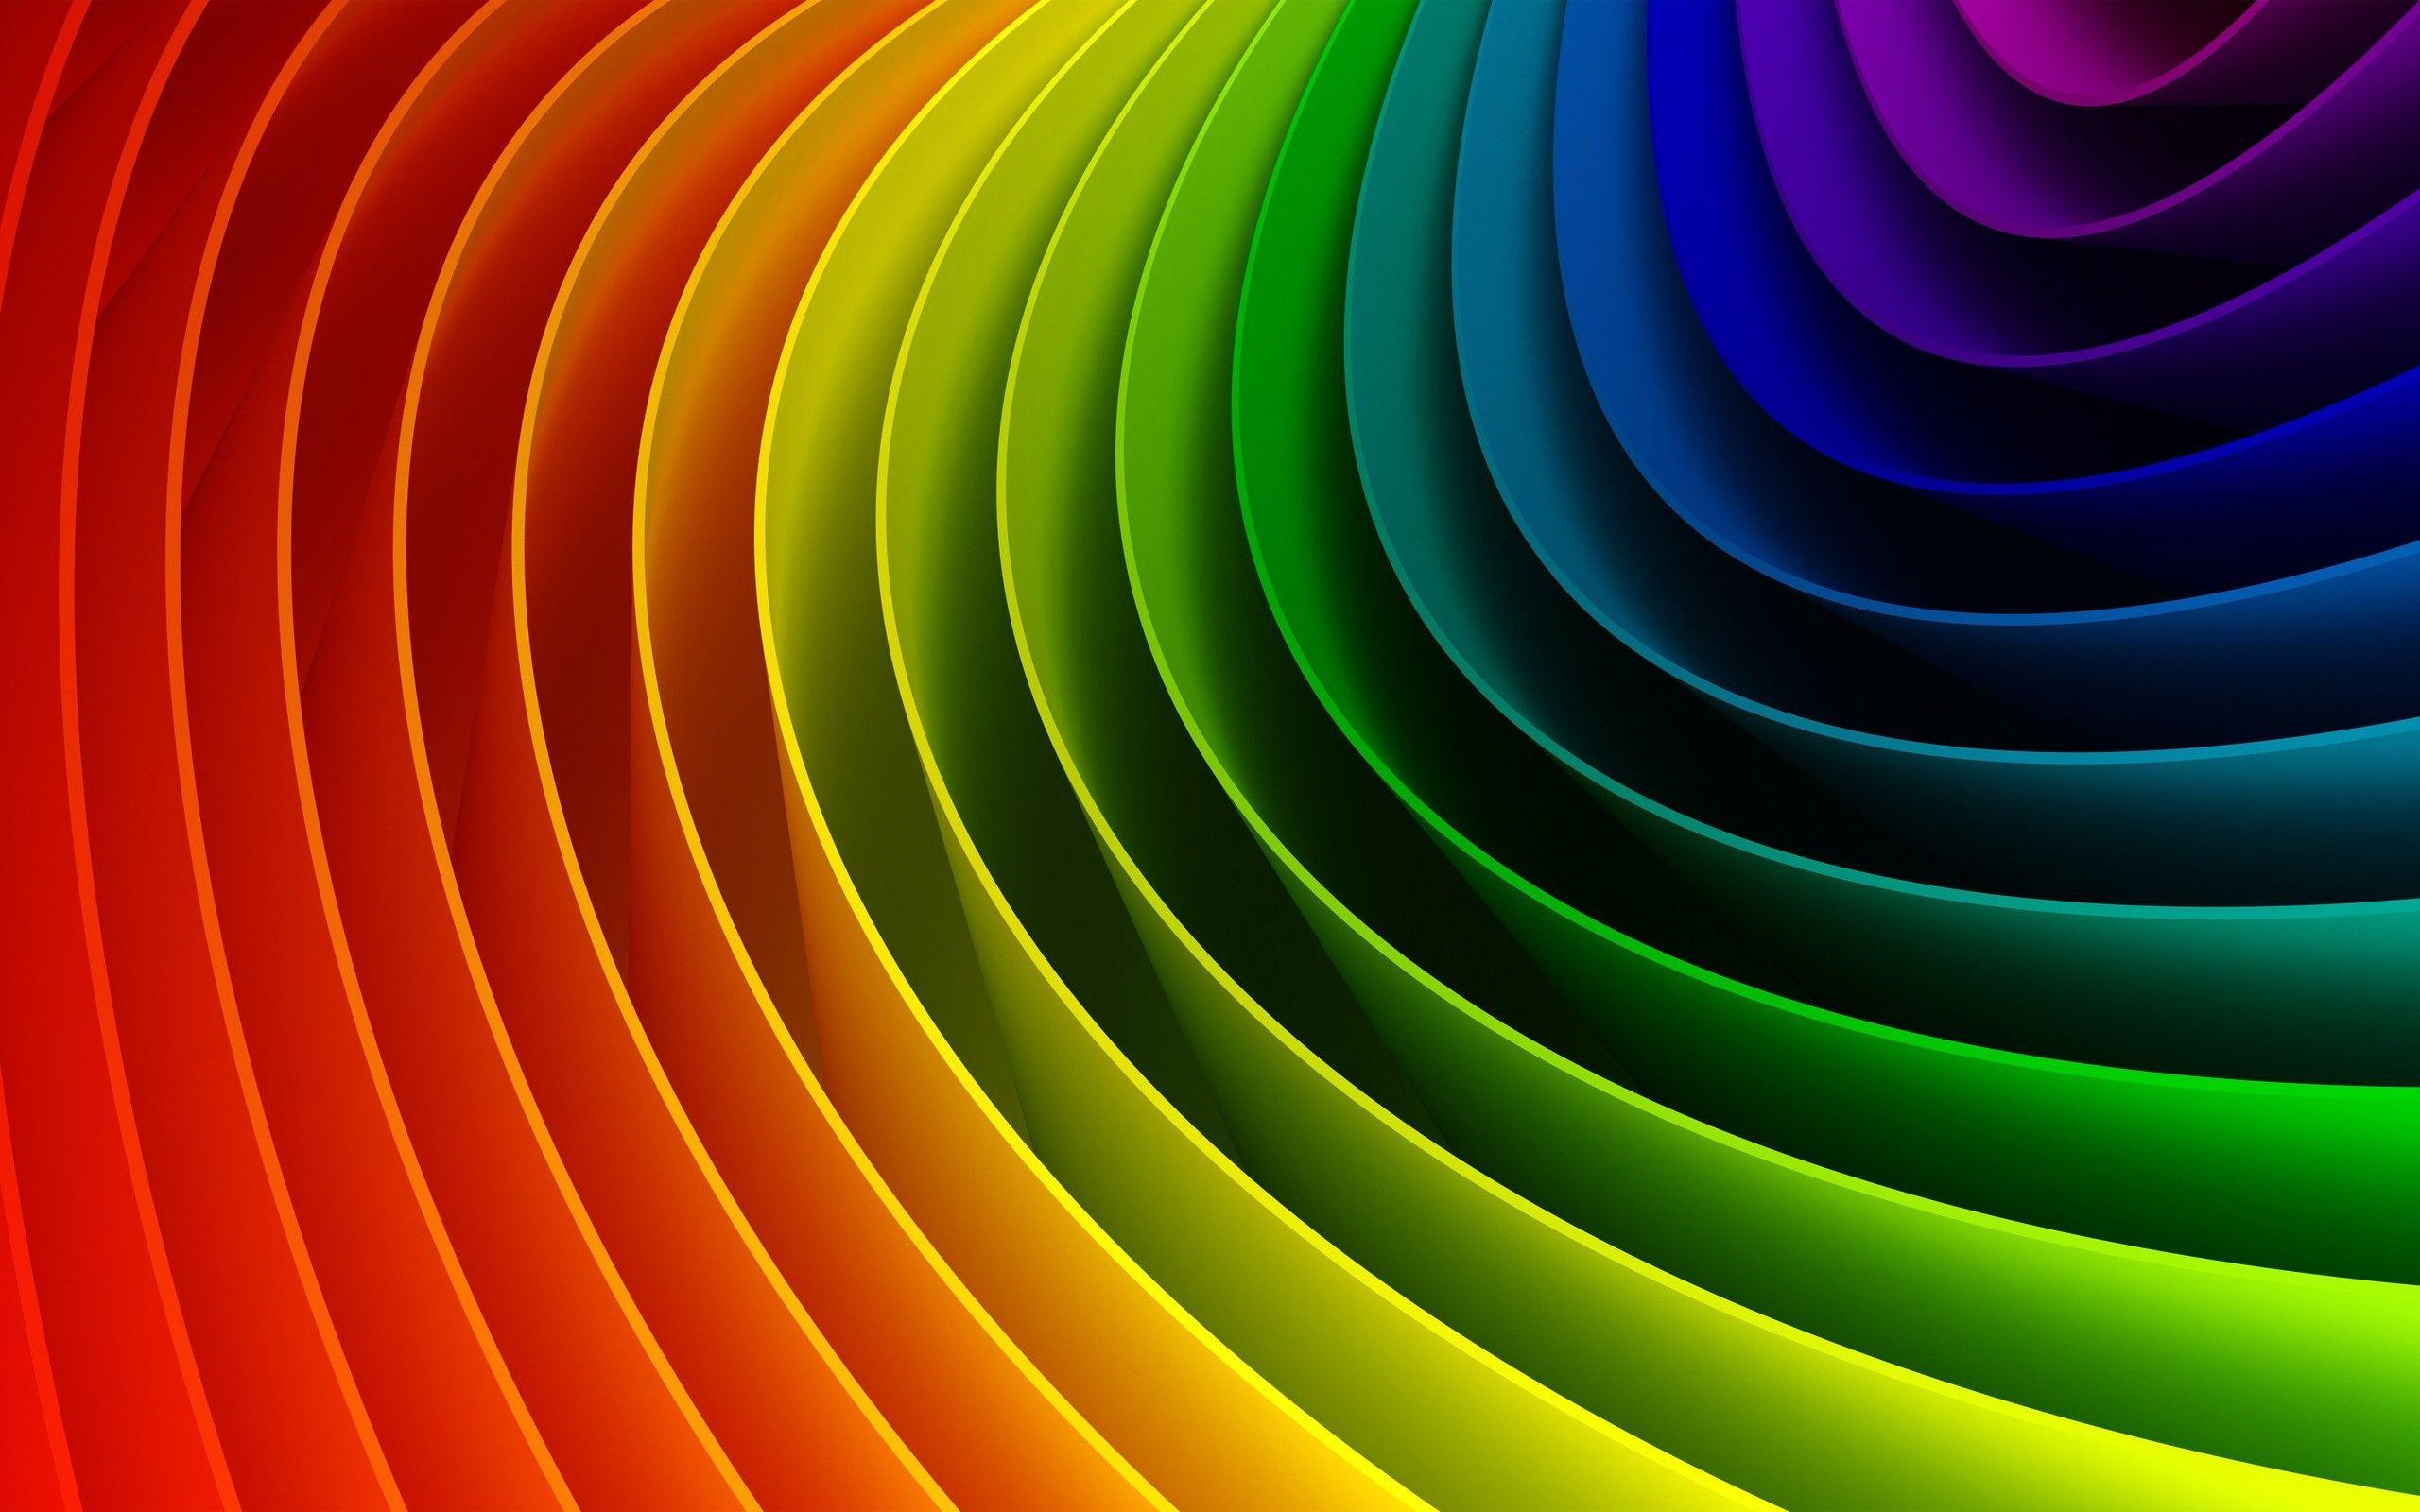 Best Wallpaper High Resolution Rainbow - 00b9049d14f10e85168564a860c16bc9  Collection_885979.jpg